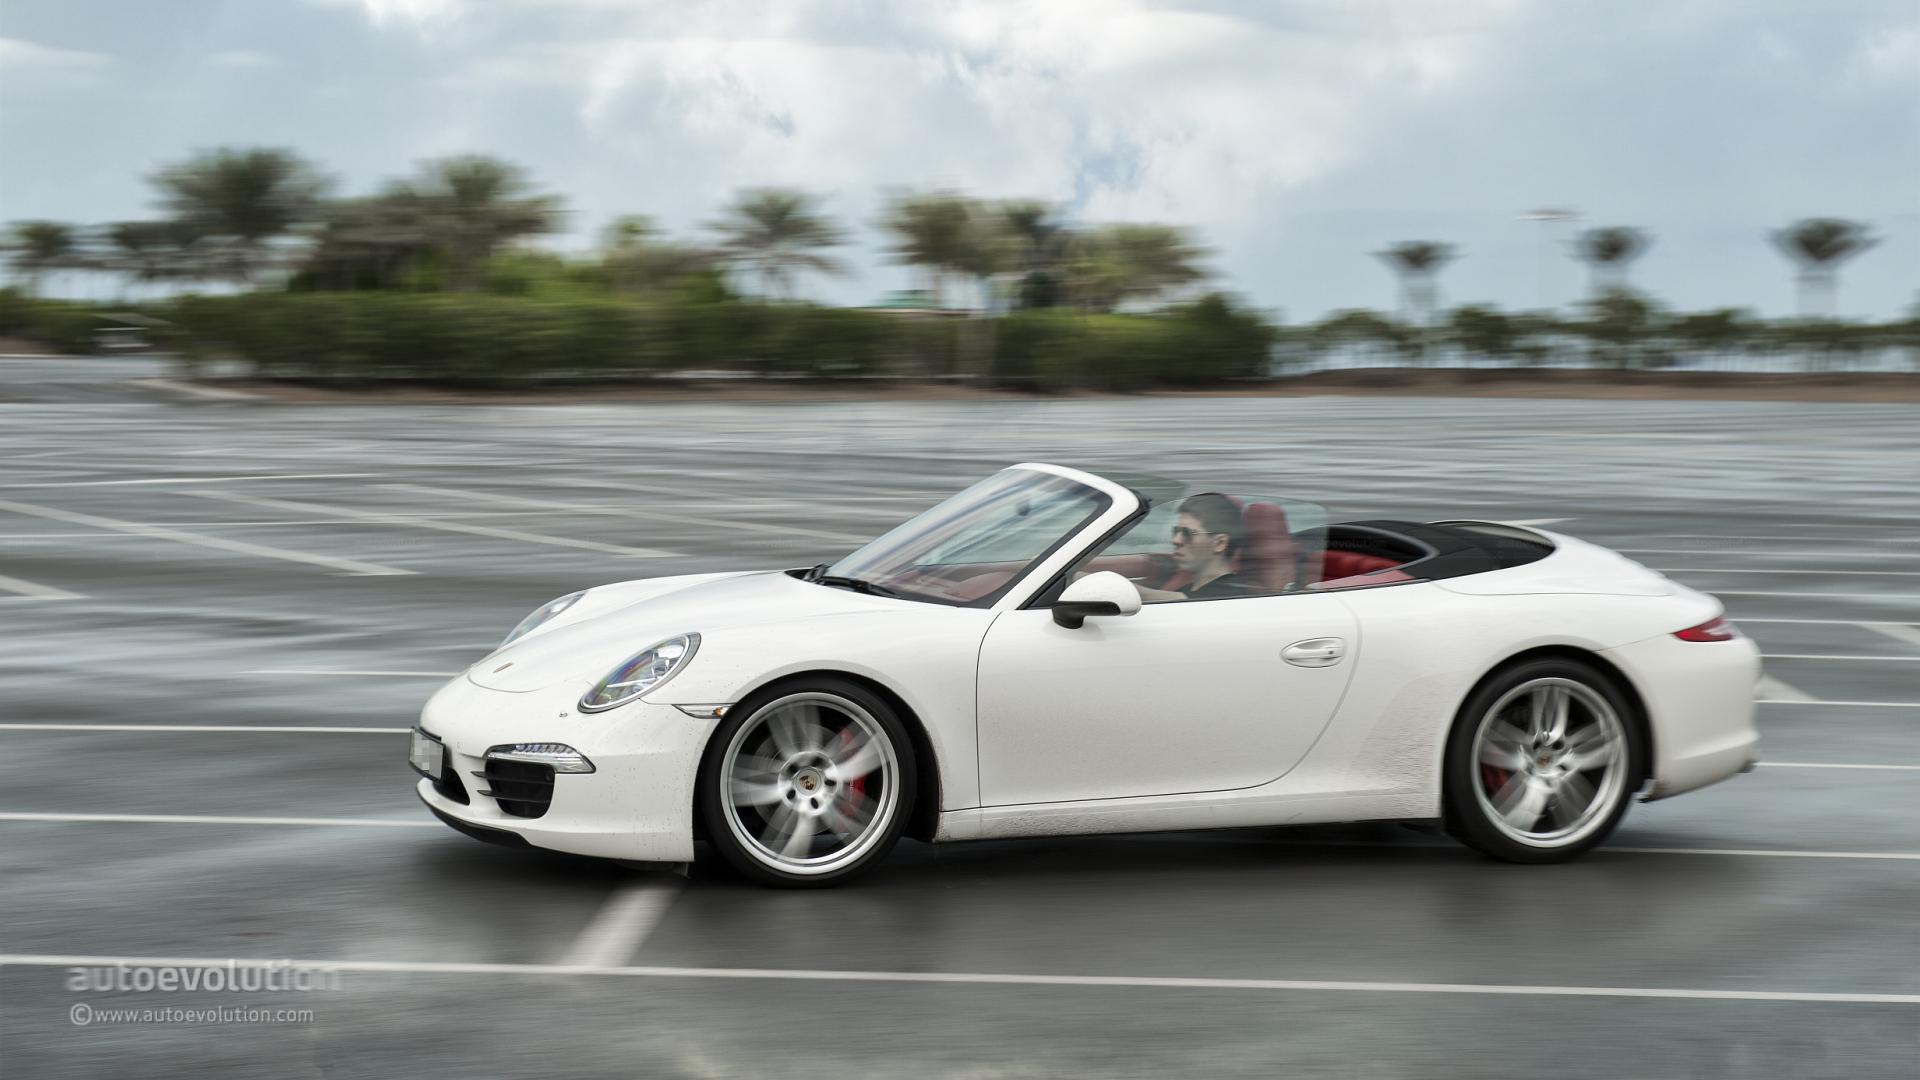 porsche 911 carrera s cabriolet review autoevolution. Black Bedroom Furniture Sets. Home Design Ideas